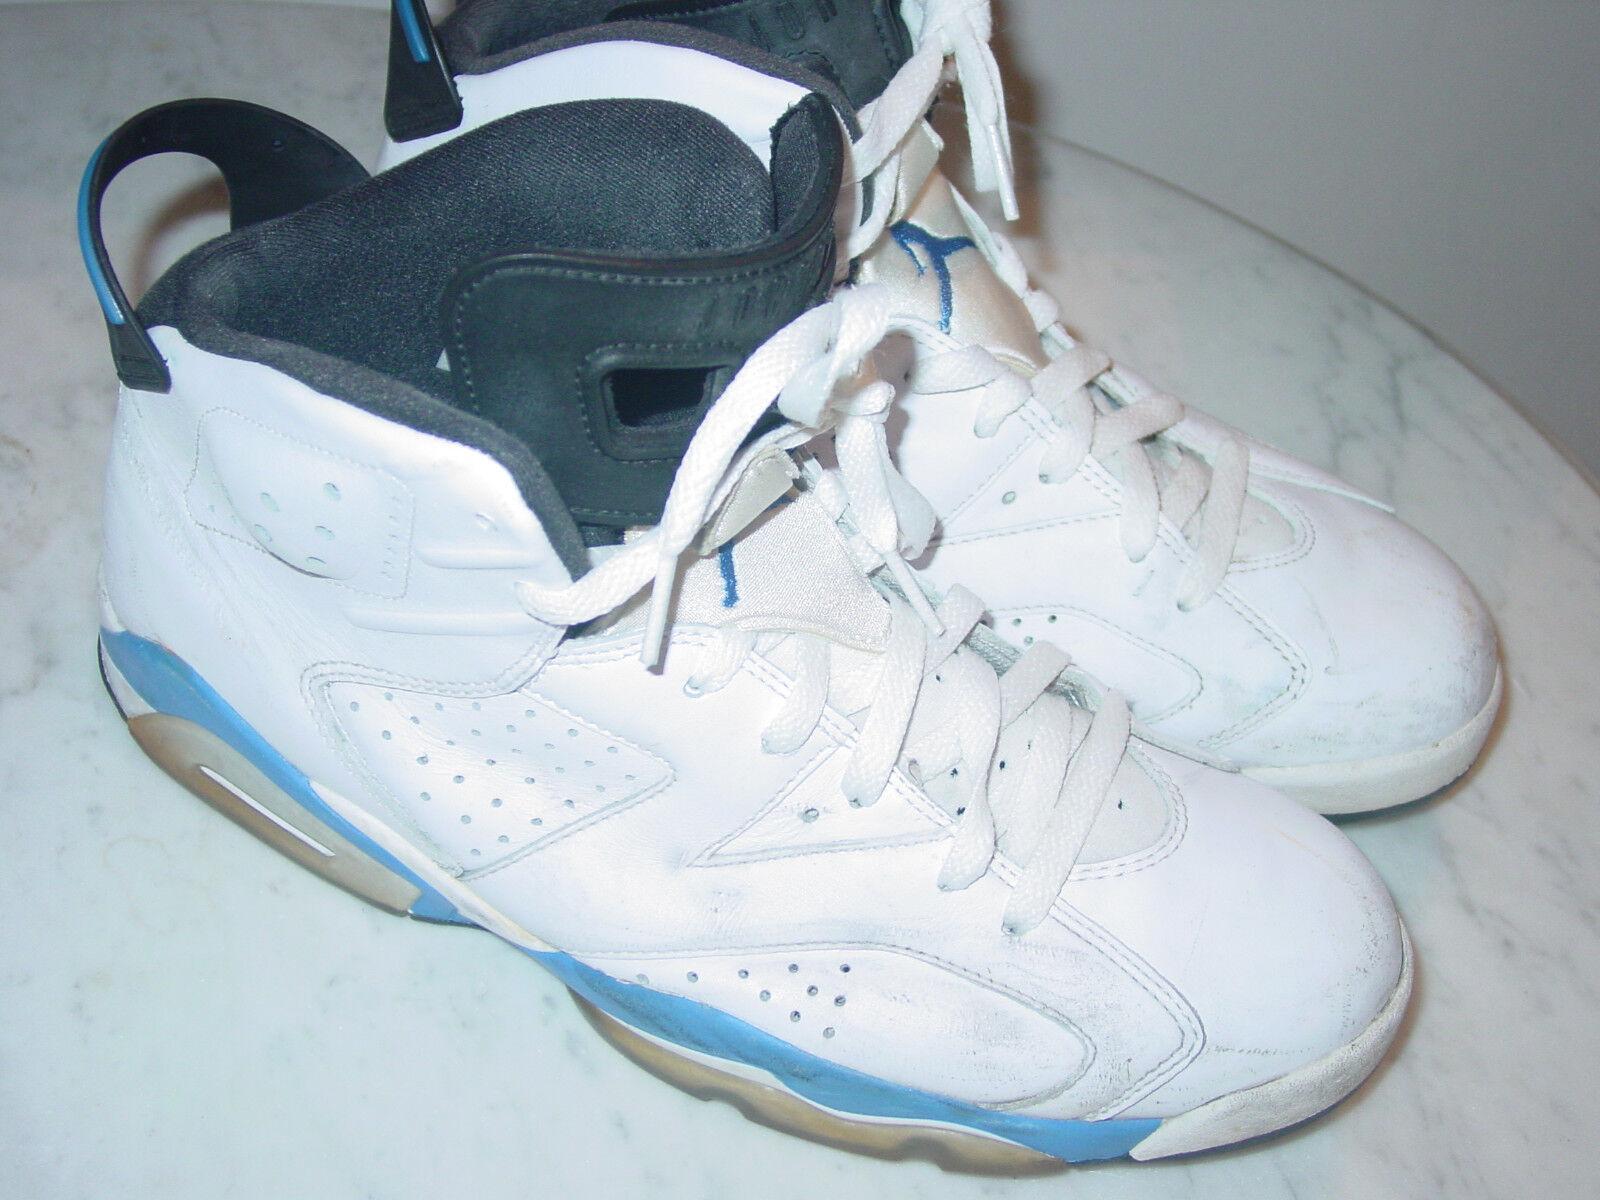 2014 Nike Air Jordan Retro 6 Weiß / Blaue Sportschuhe!Größe 10.5 Verkauft!